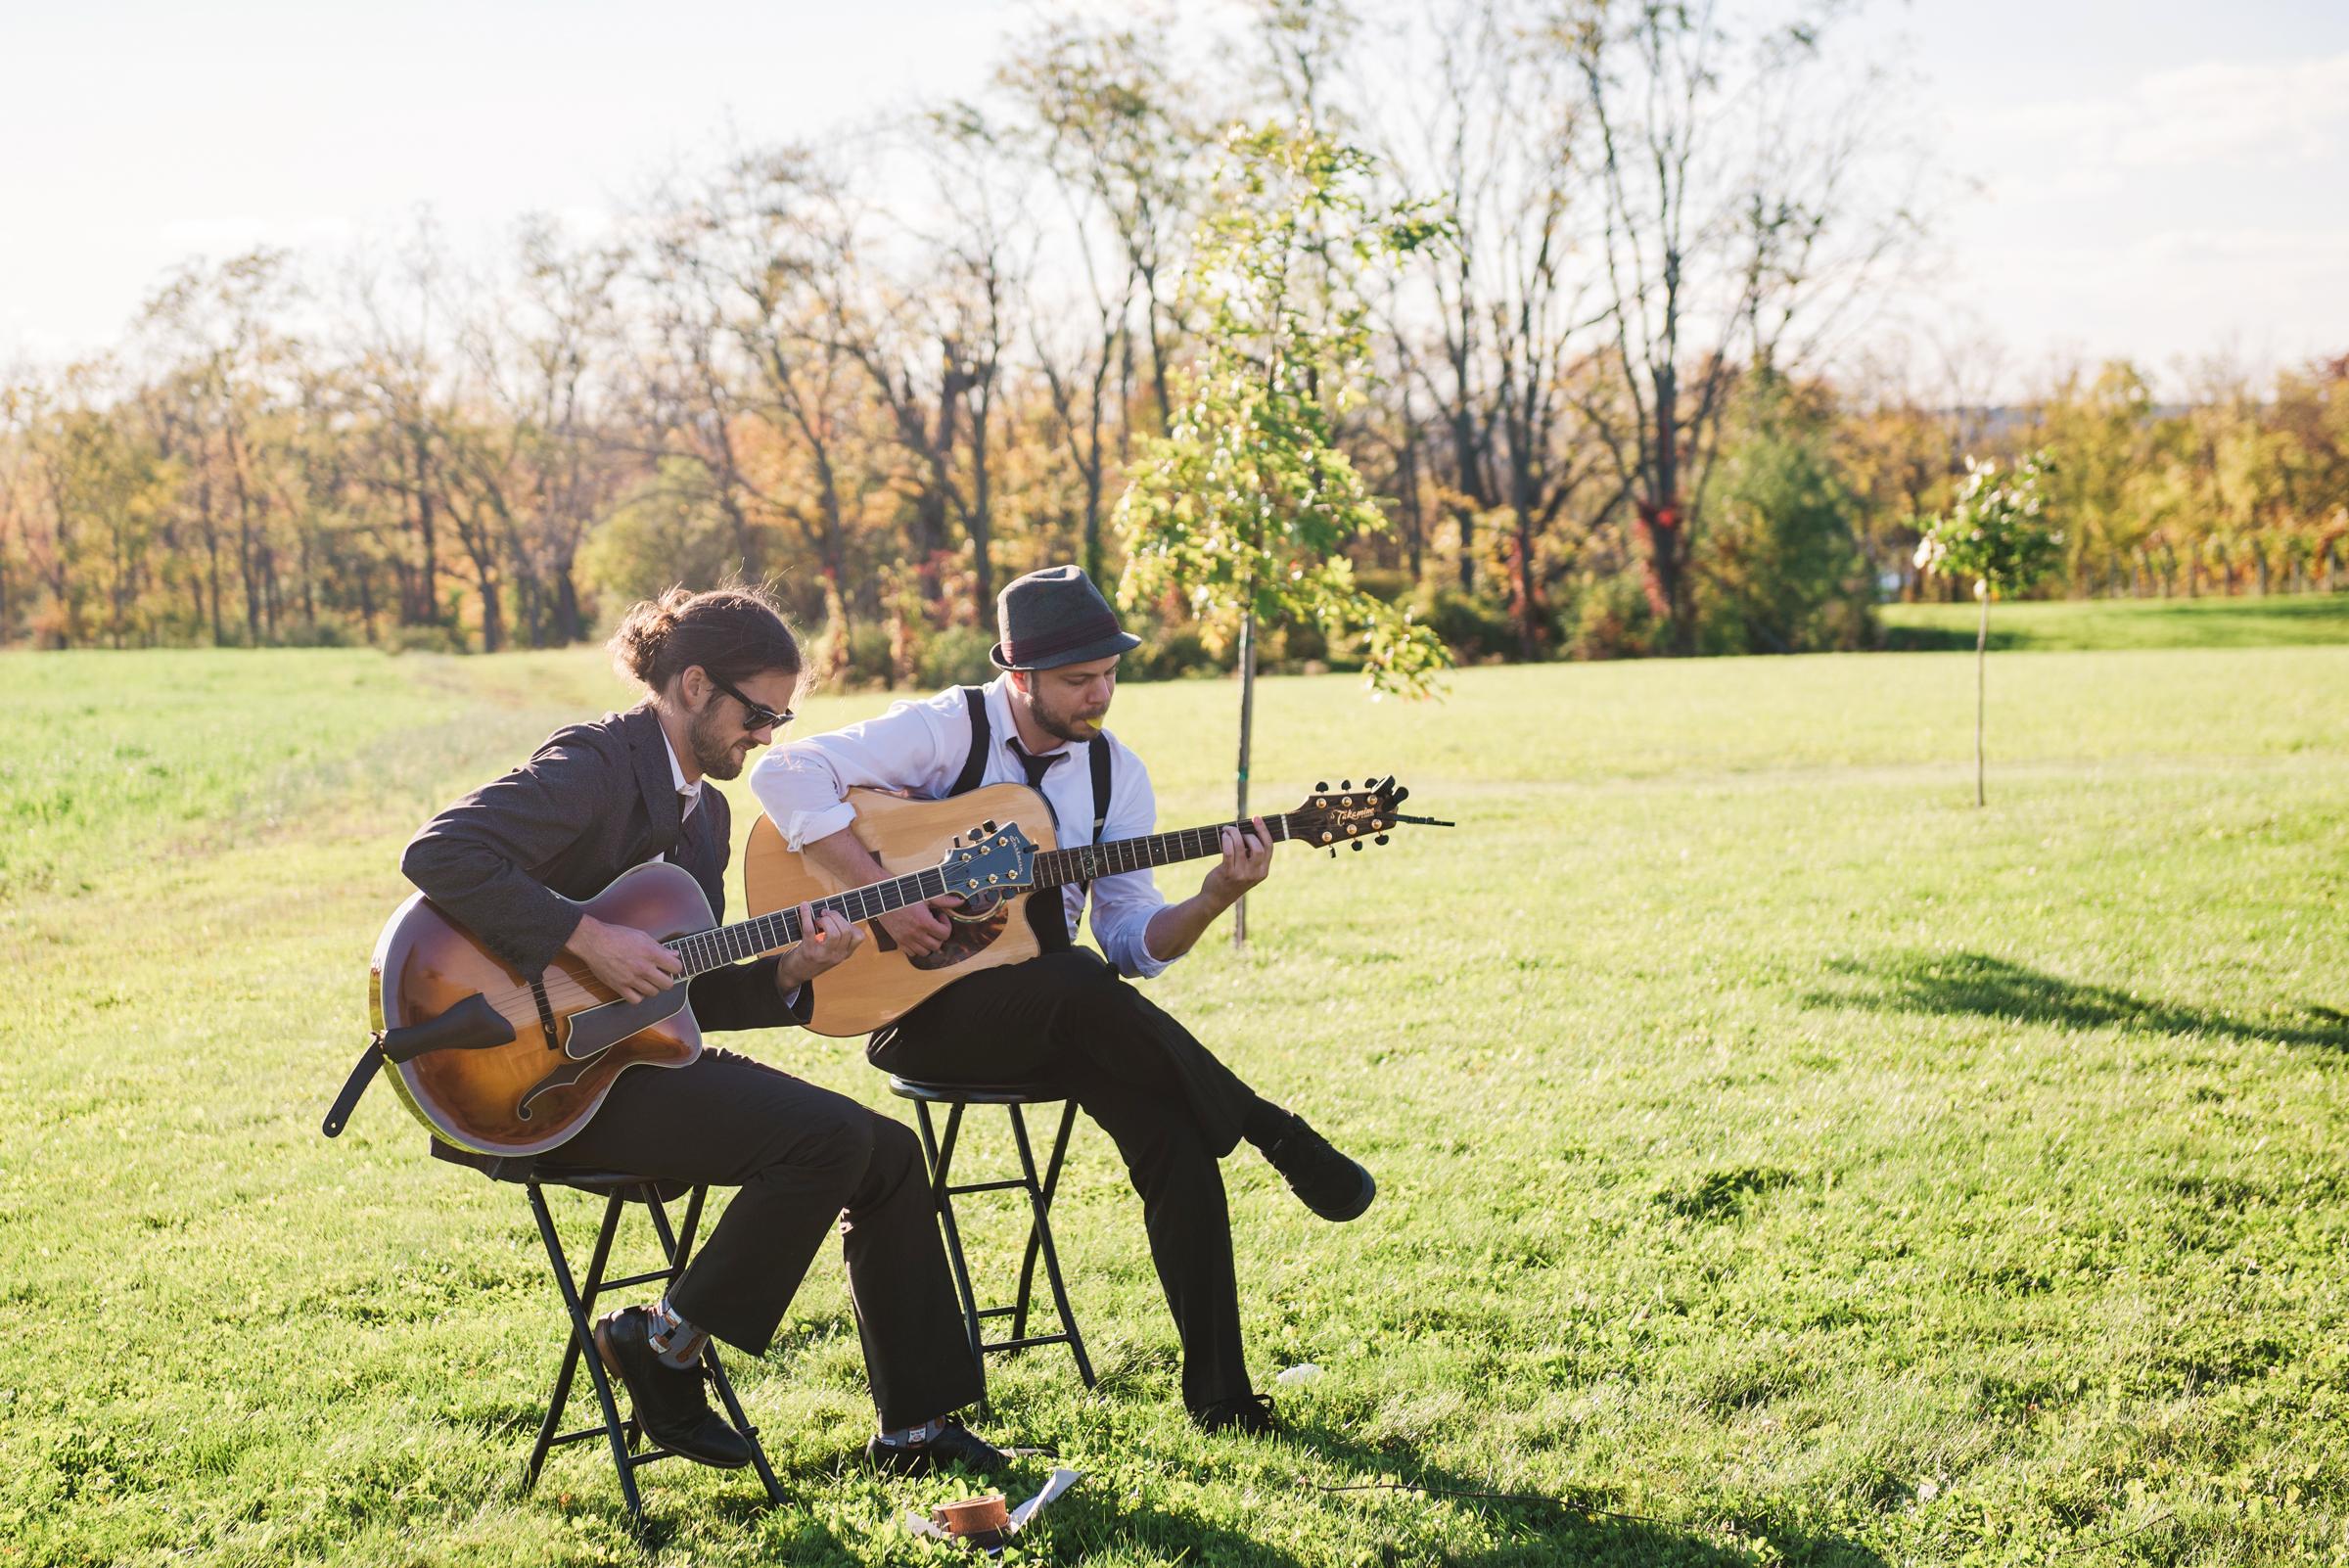 Zugibe_Vineyards_Finger_Lakes_Wedding_JILL_STUDIO_Rochester_NY_Photographer_DSC_3911.jpg